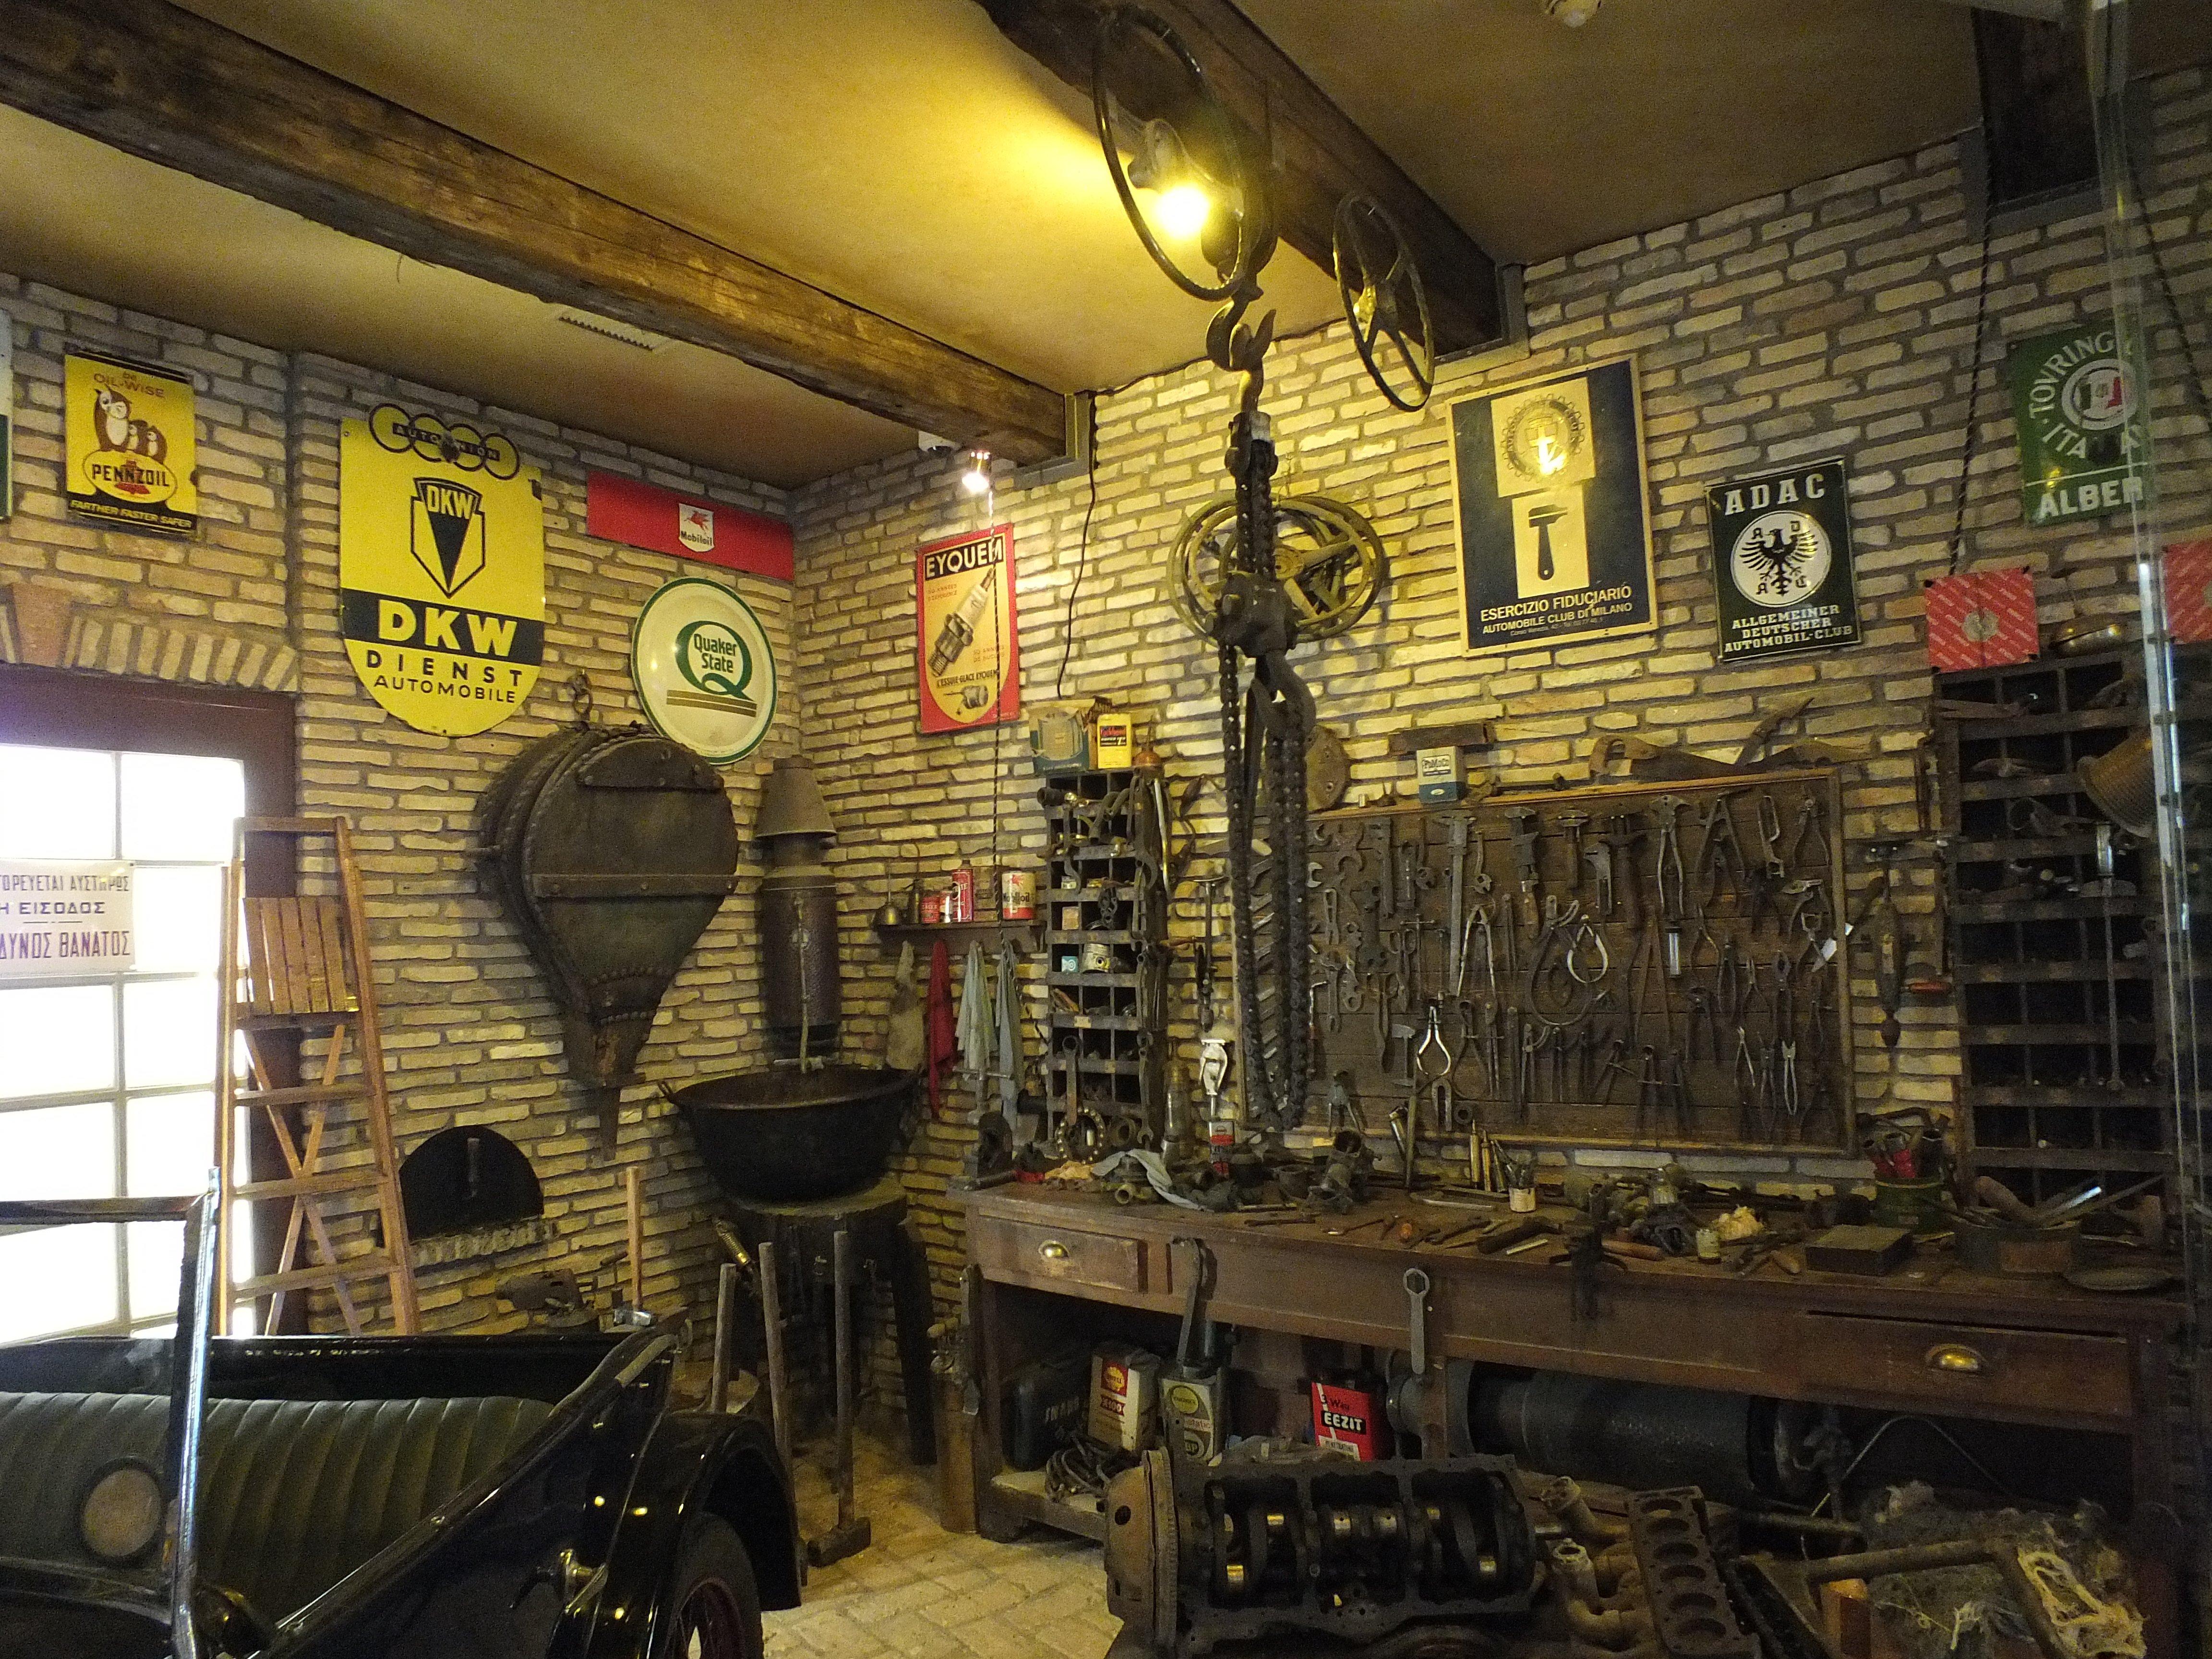 ideas small mechanics garage - Oldtimer car workshop retro wallpaper 4608x3456